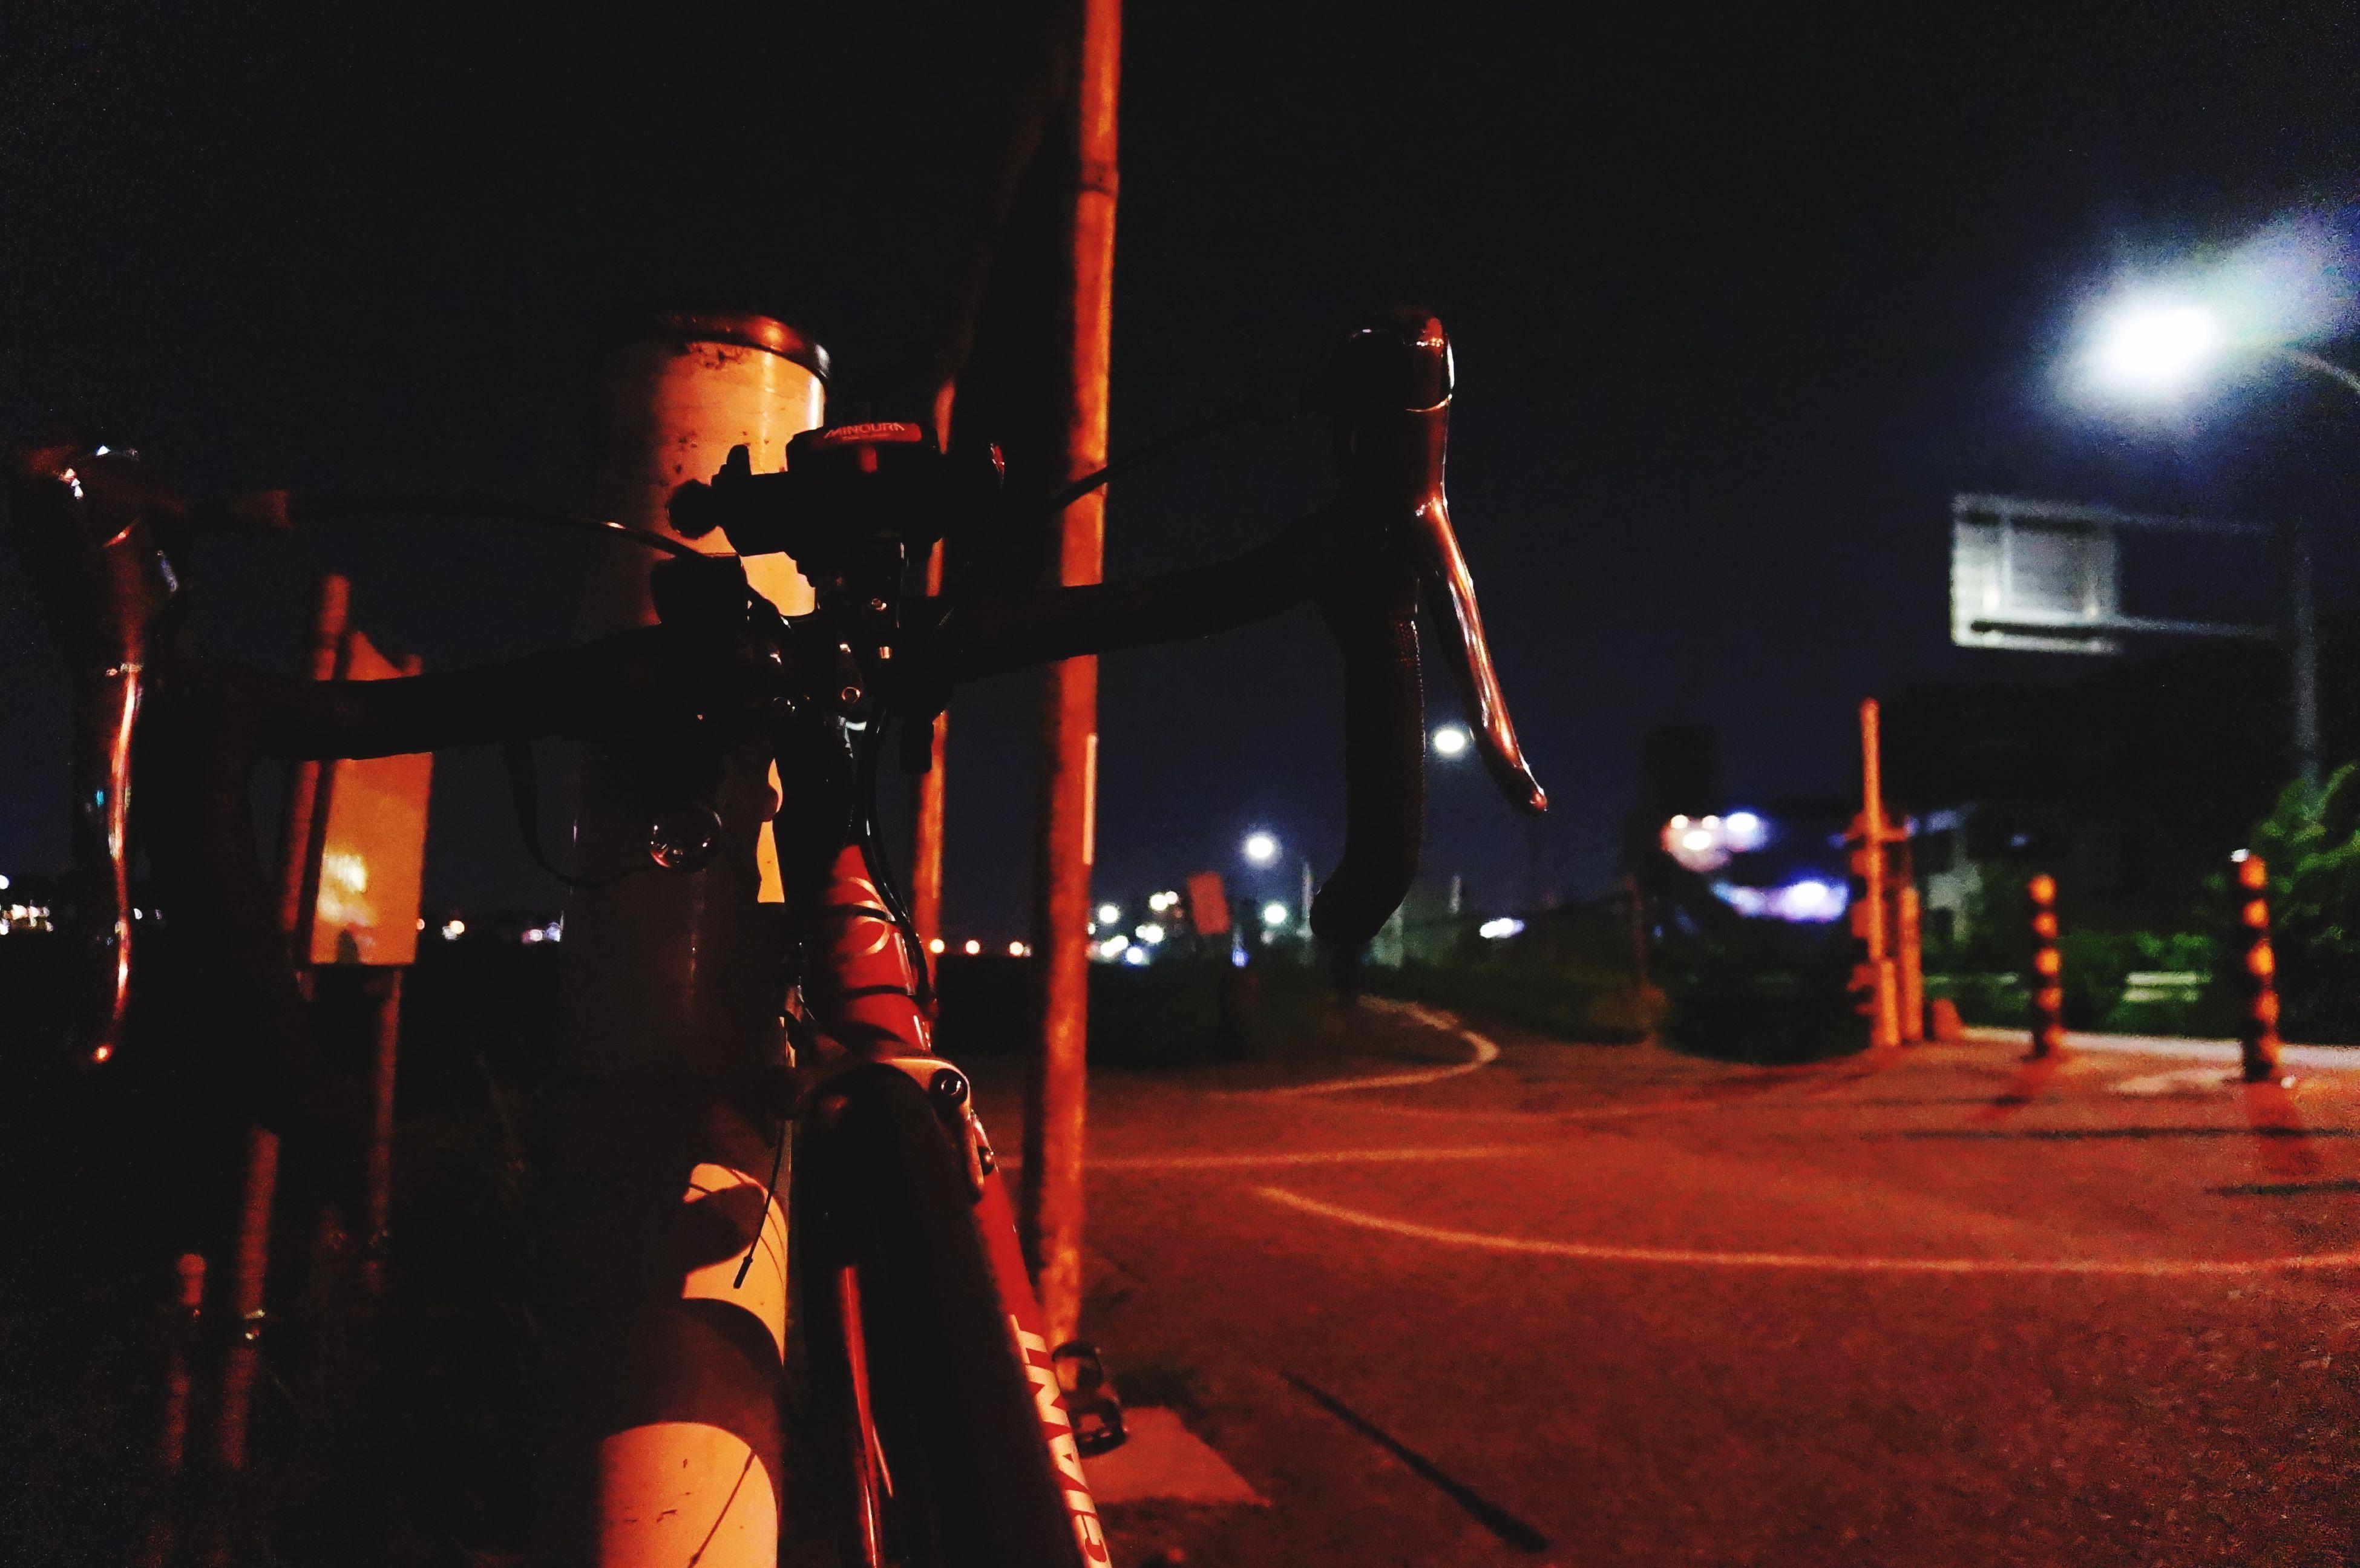 illuminated, night, street light, lighting equipment, men, lifestyles, street, leisure activity, person, light - natural phenomenon, transportation, outdoors, incidental people, dark, unrecognizable person, standing, rear view, medium group of people